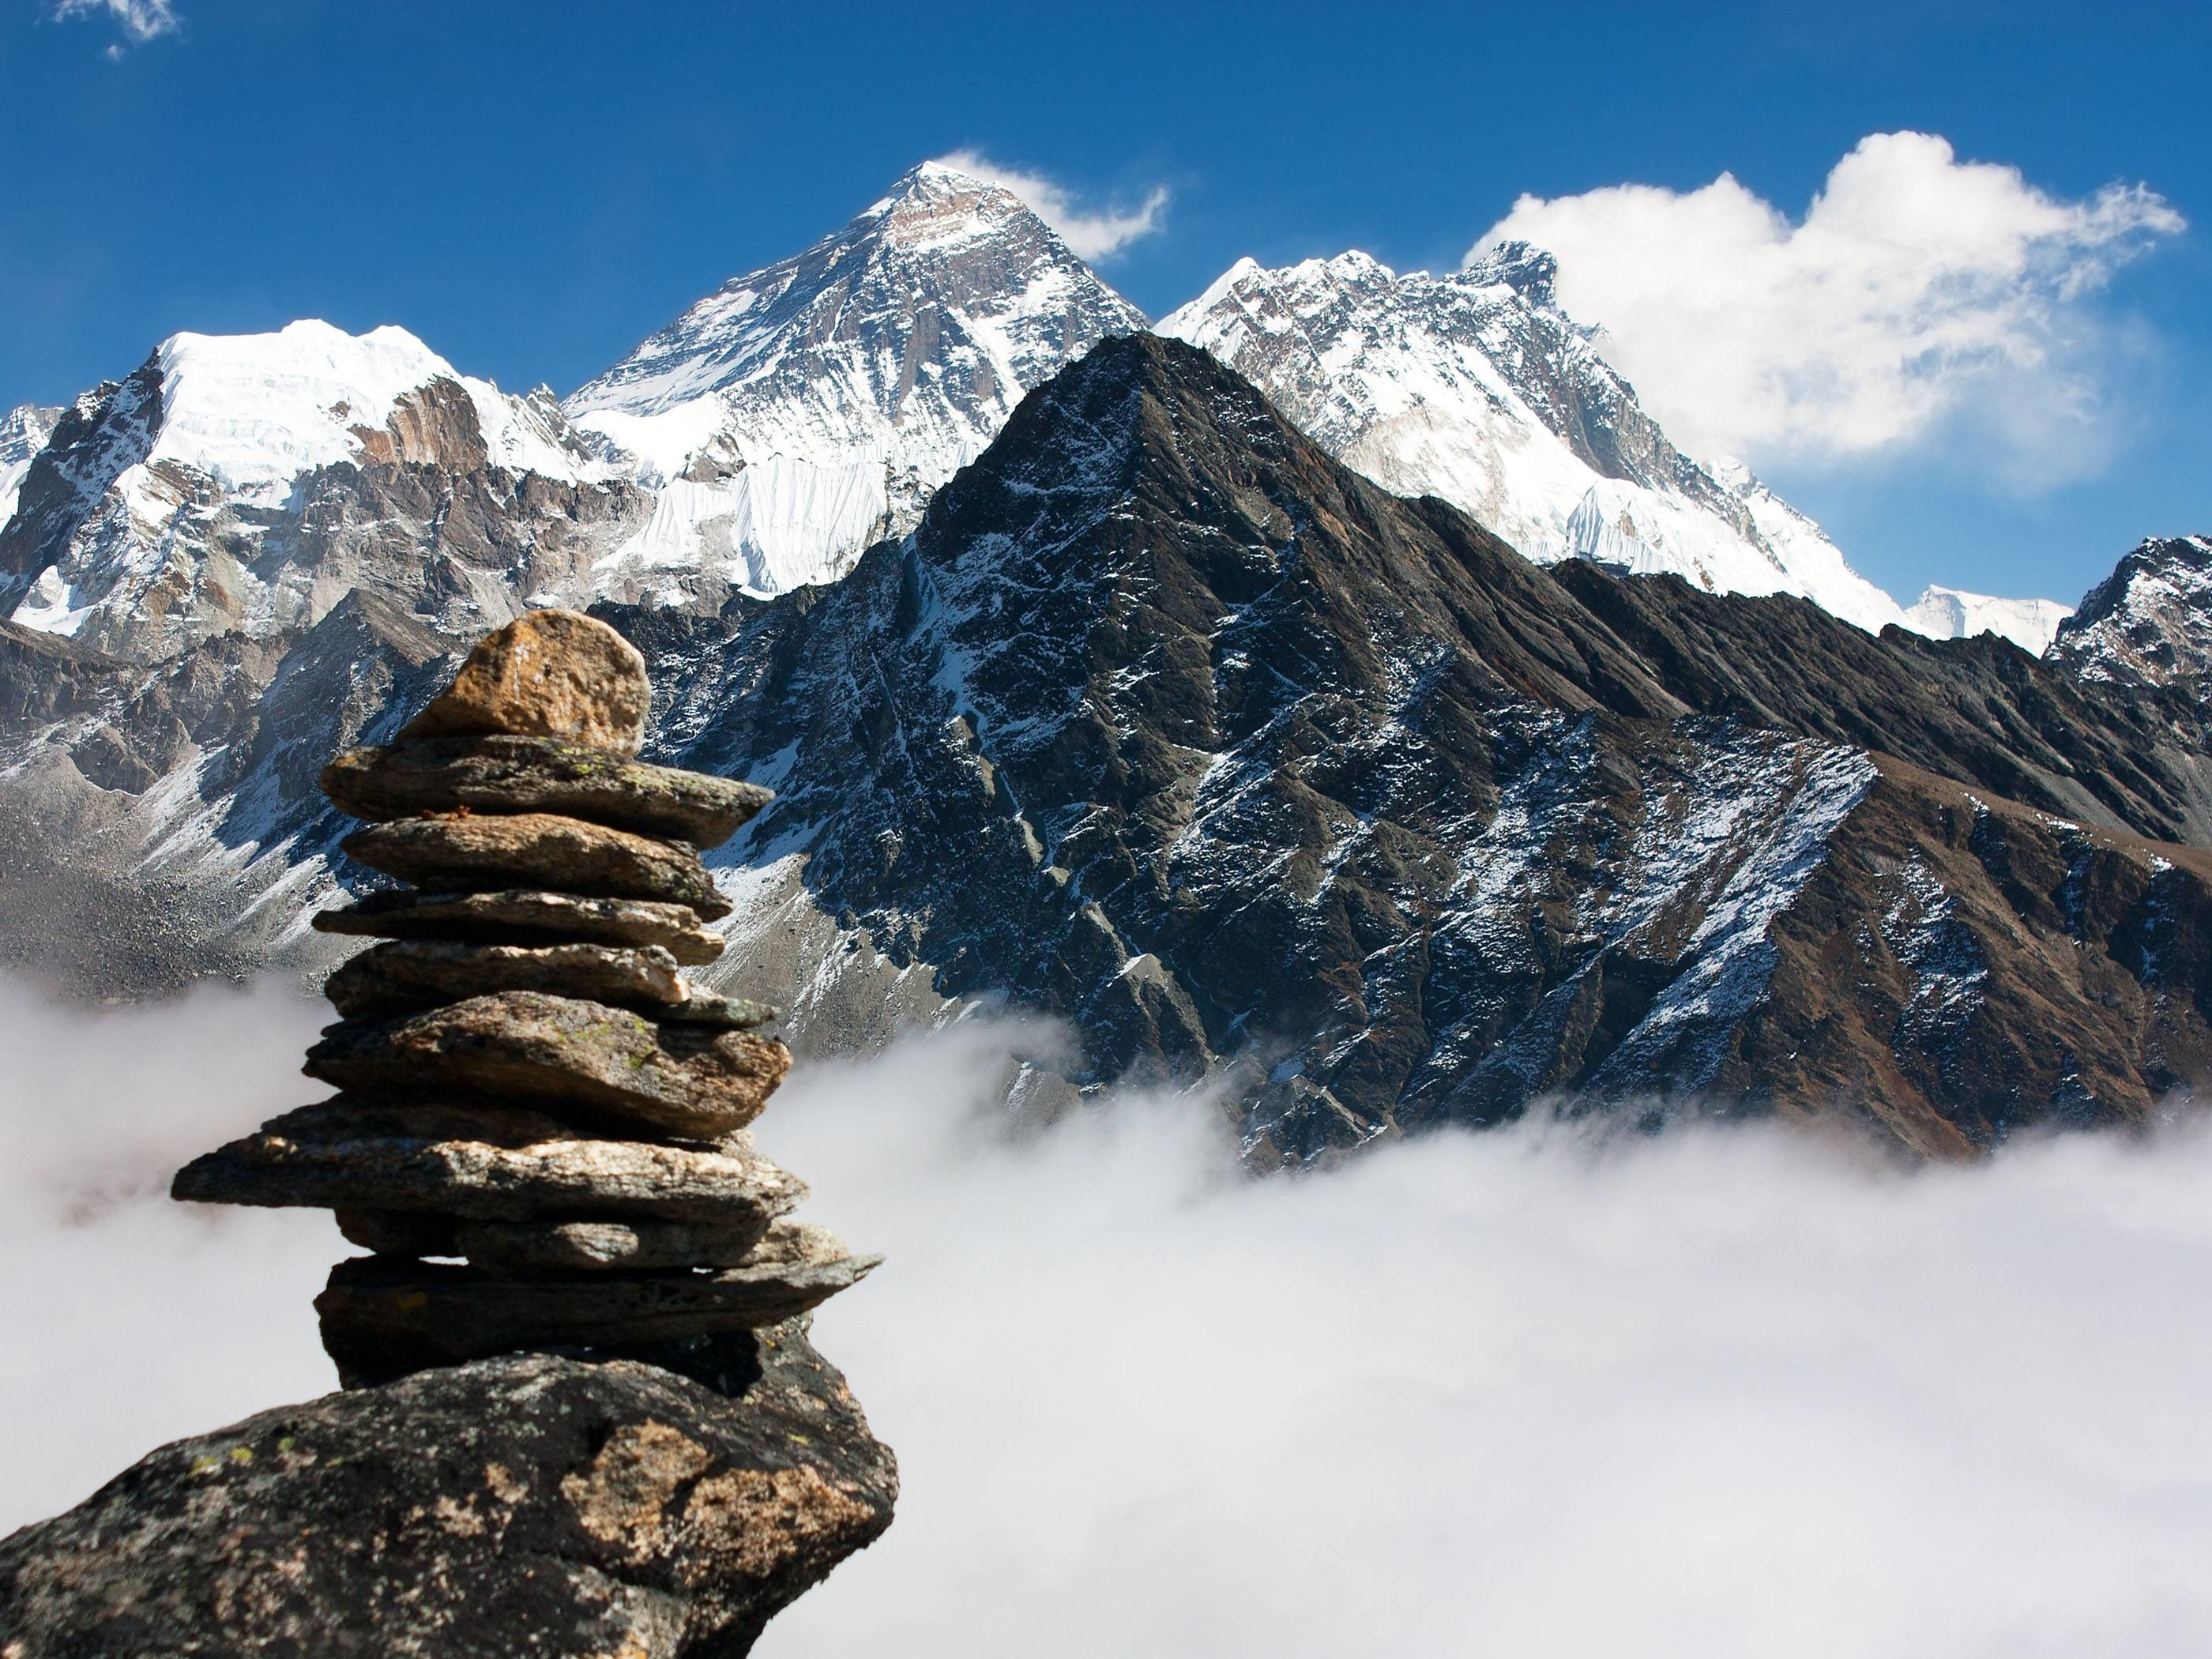 Mount Everest Wallpapers | Free Desk Wallpapers